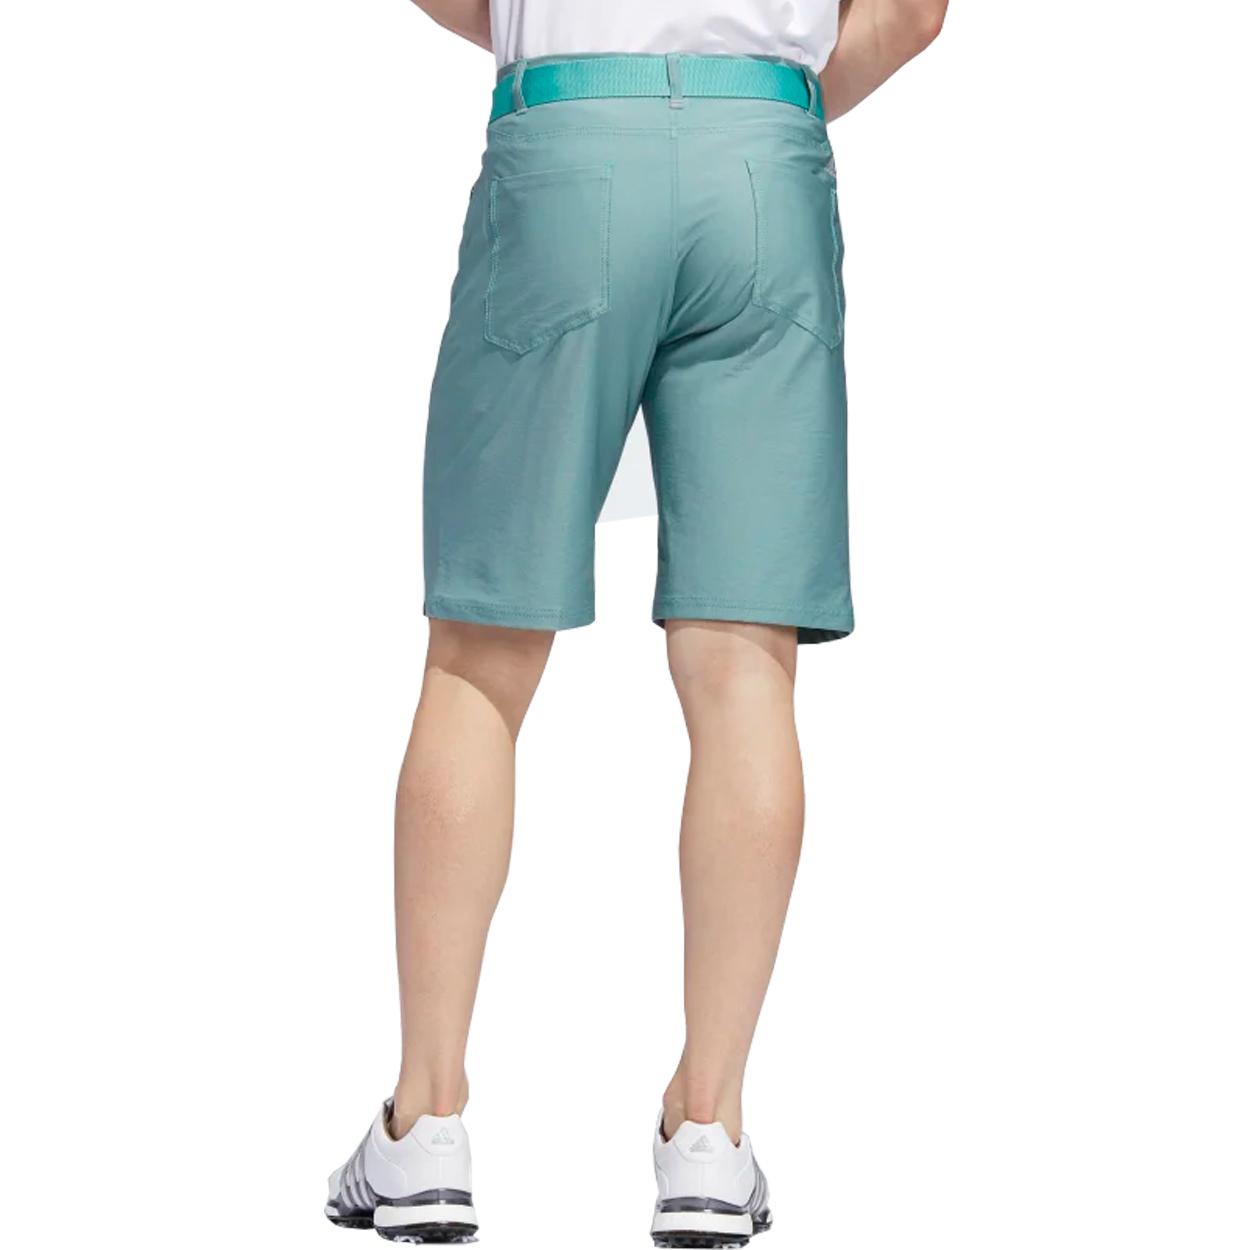 Adidas-Golf-Men-039-s-Ultimate365-Heather-5-Pocket-Shorts-Brand-New thumbnail 8